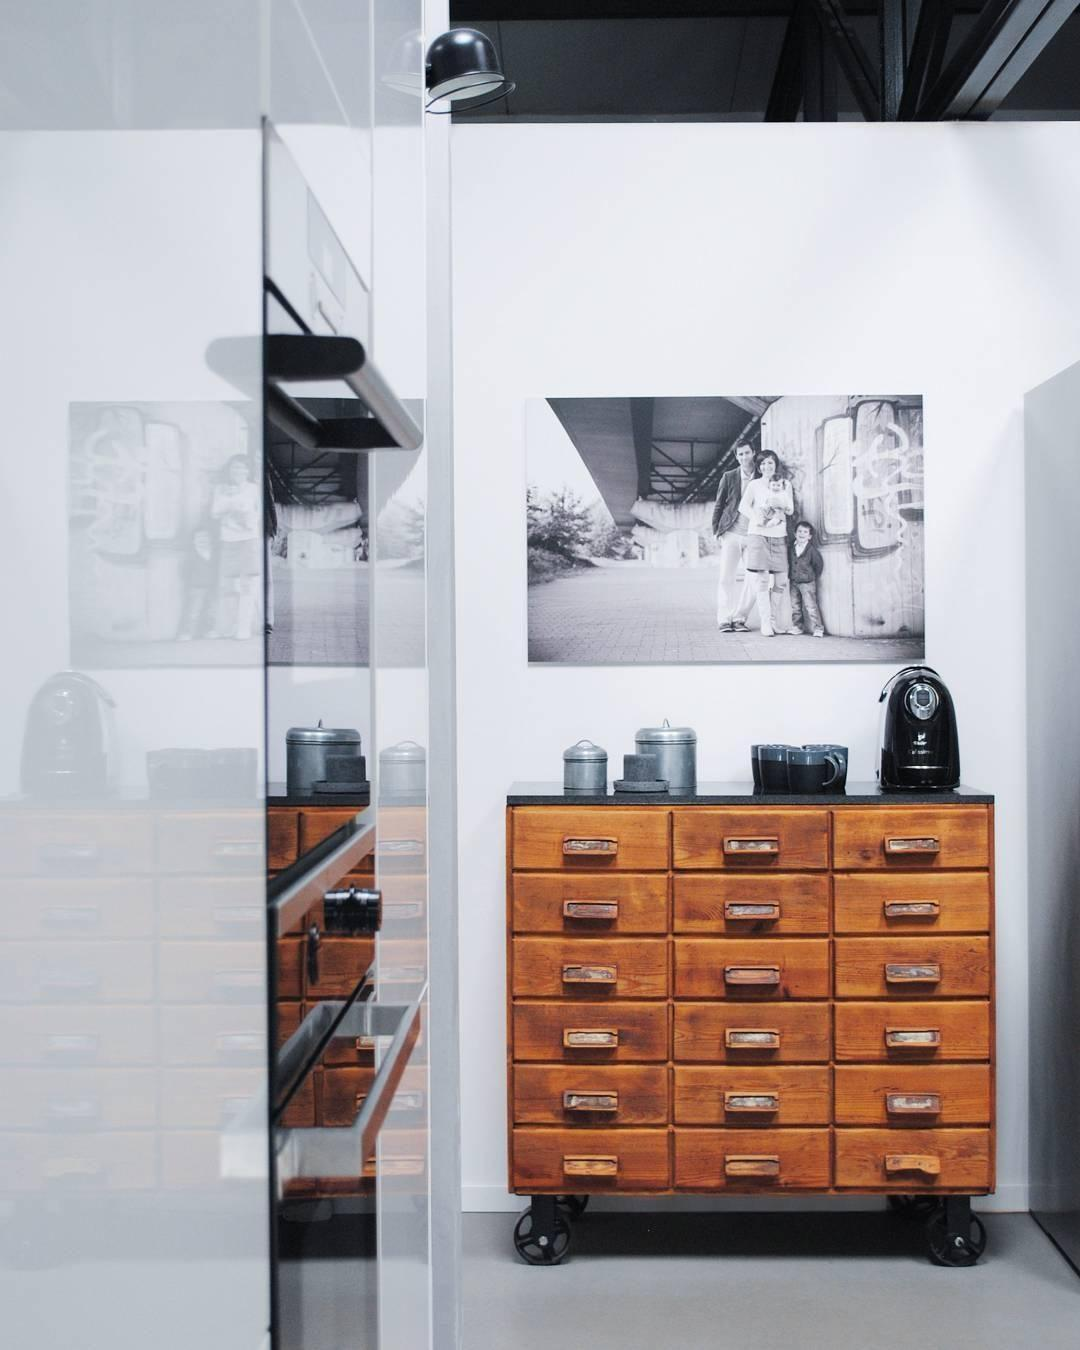 kche apothekerschrank kchenschrank kitchen loft loftinterior vintage vintagembel - Kchenschrank Ideen Fotos